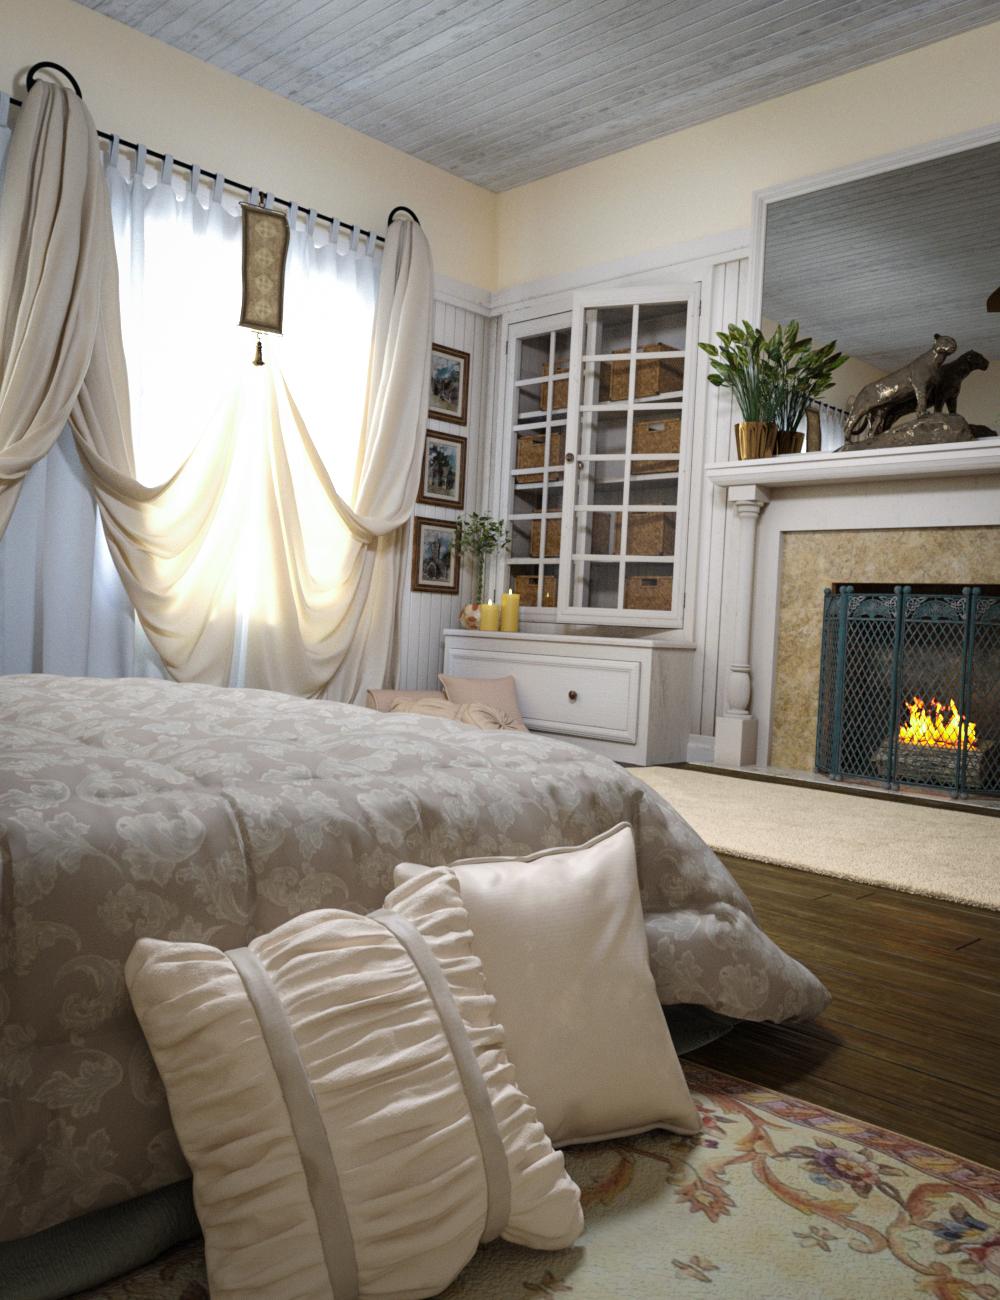 Woodman House: The Bedroom by: SloshWerks, 3D Models by Daz 3D